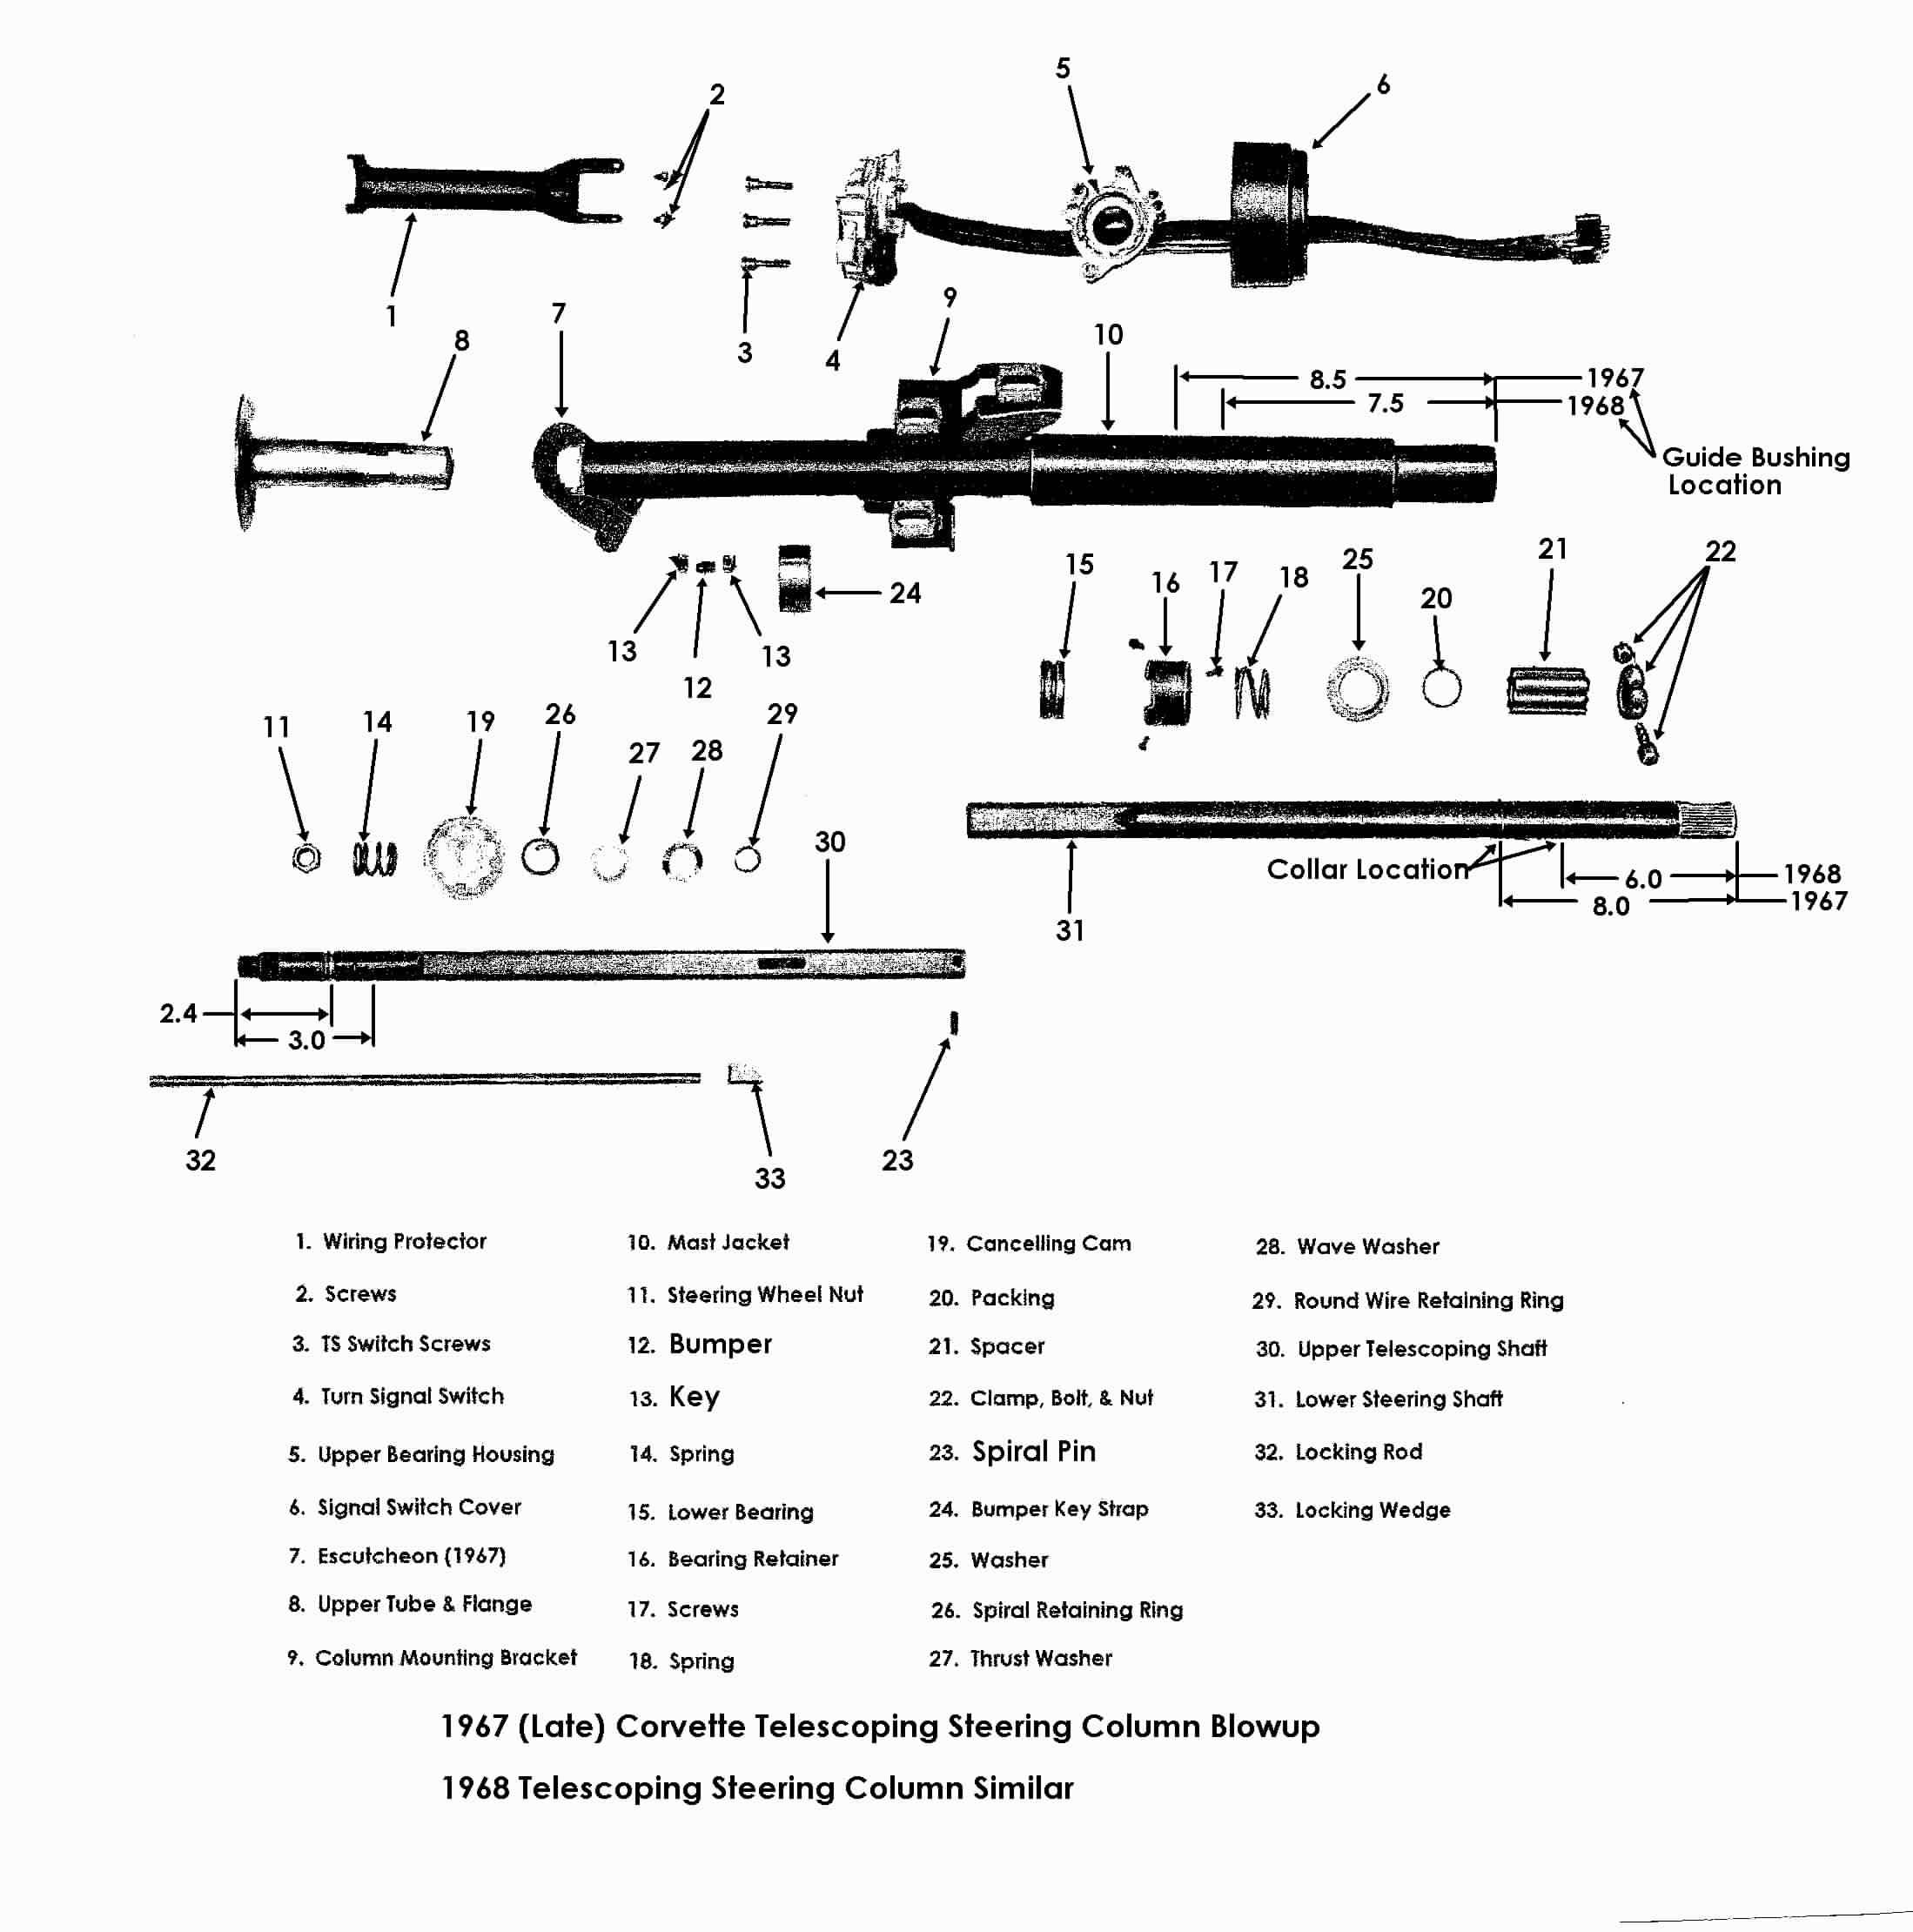 1967 chevelle steering column diagram lutron led dimmer wiring wheel get free image